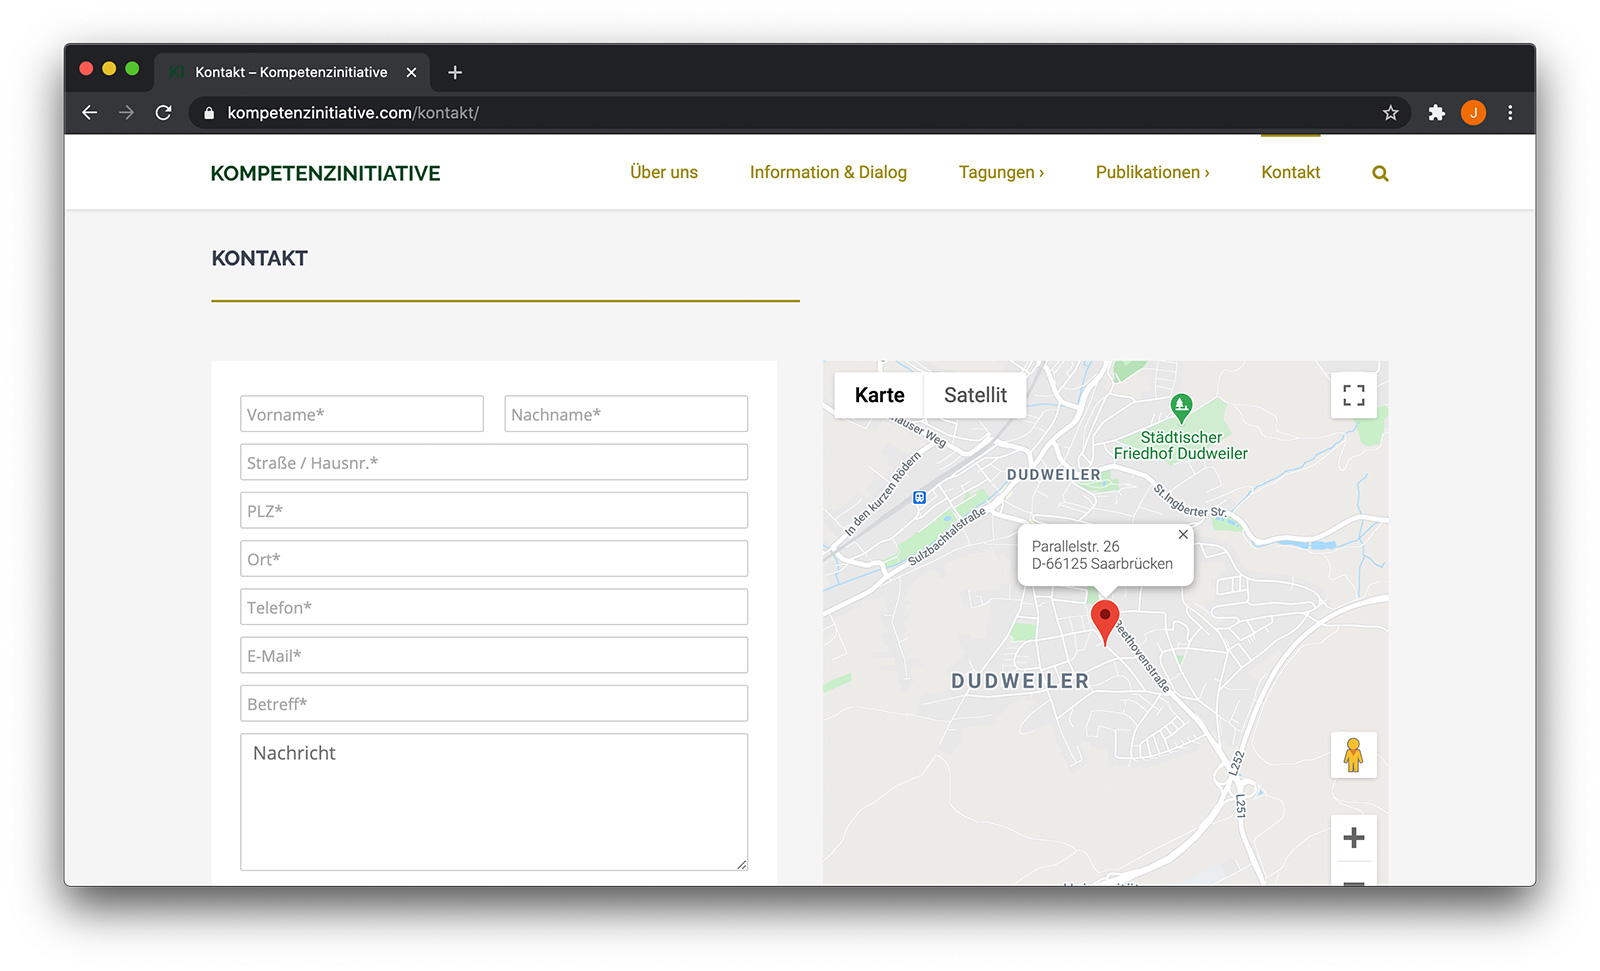 Kompetenzinitiative Screenshot